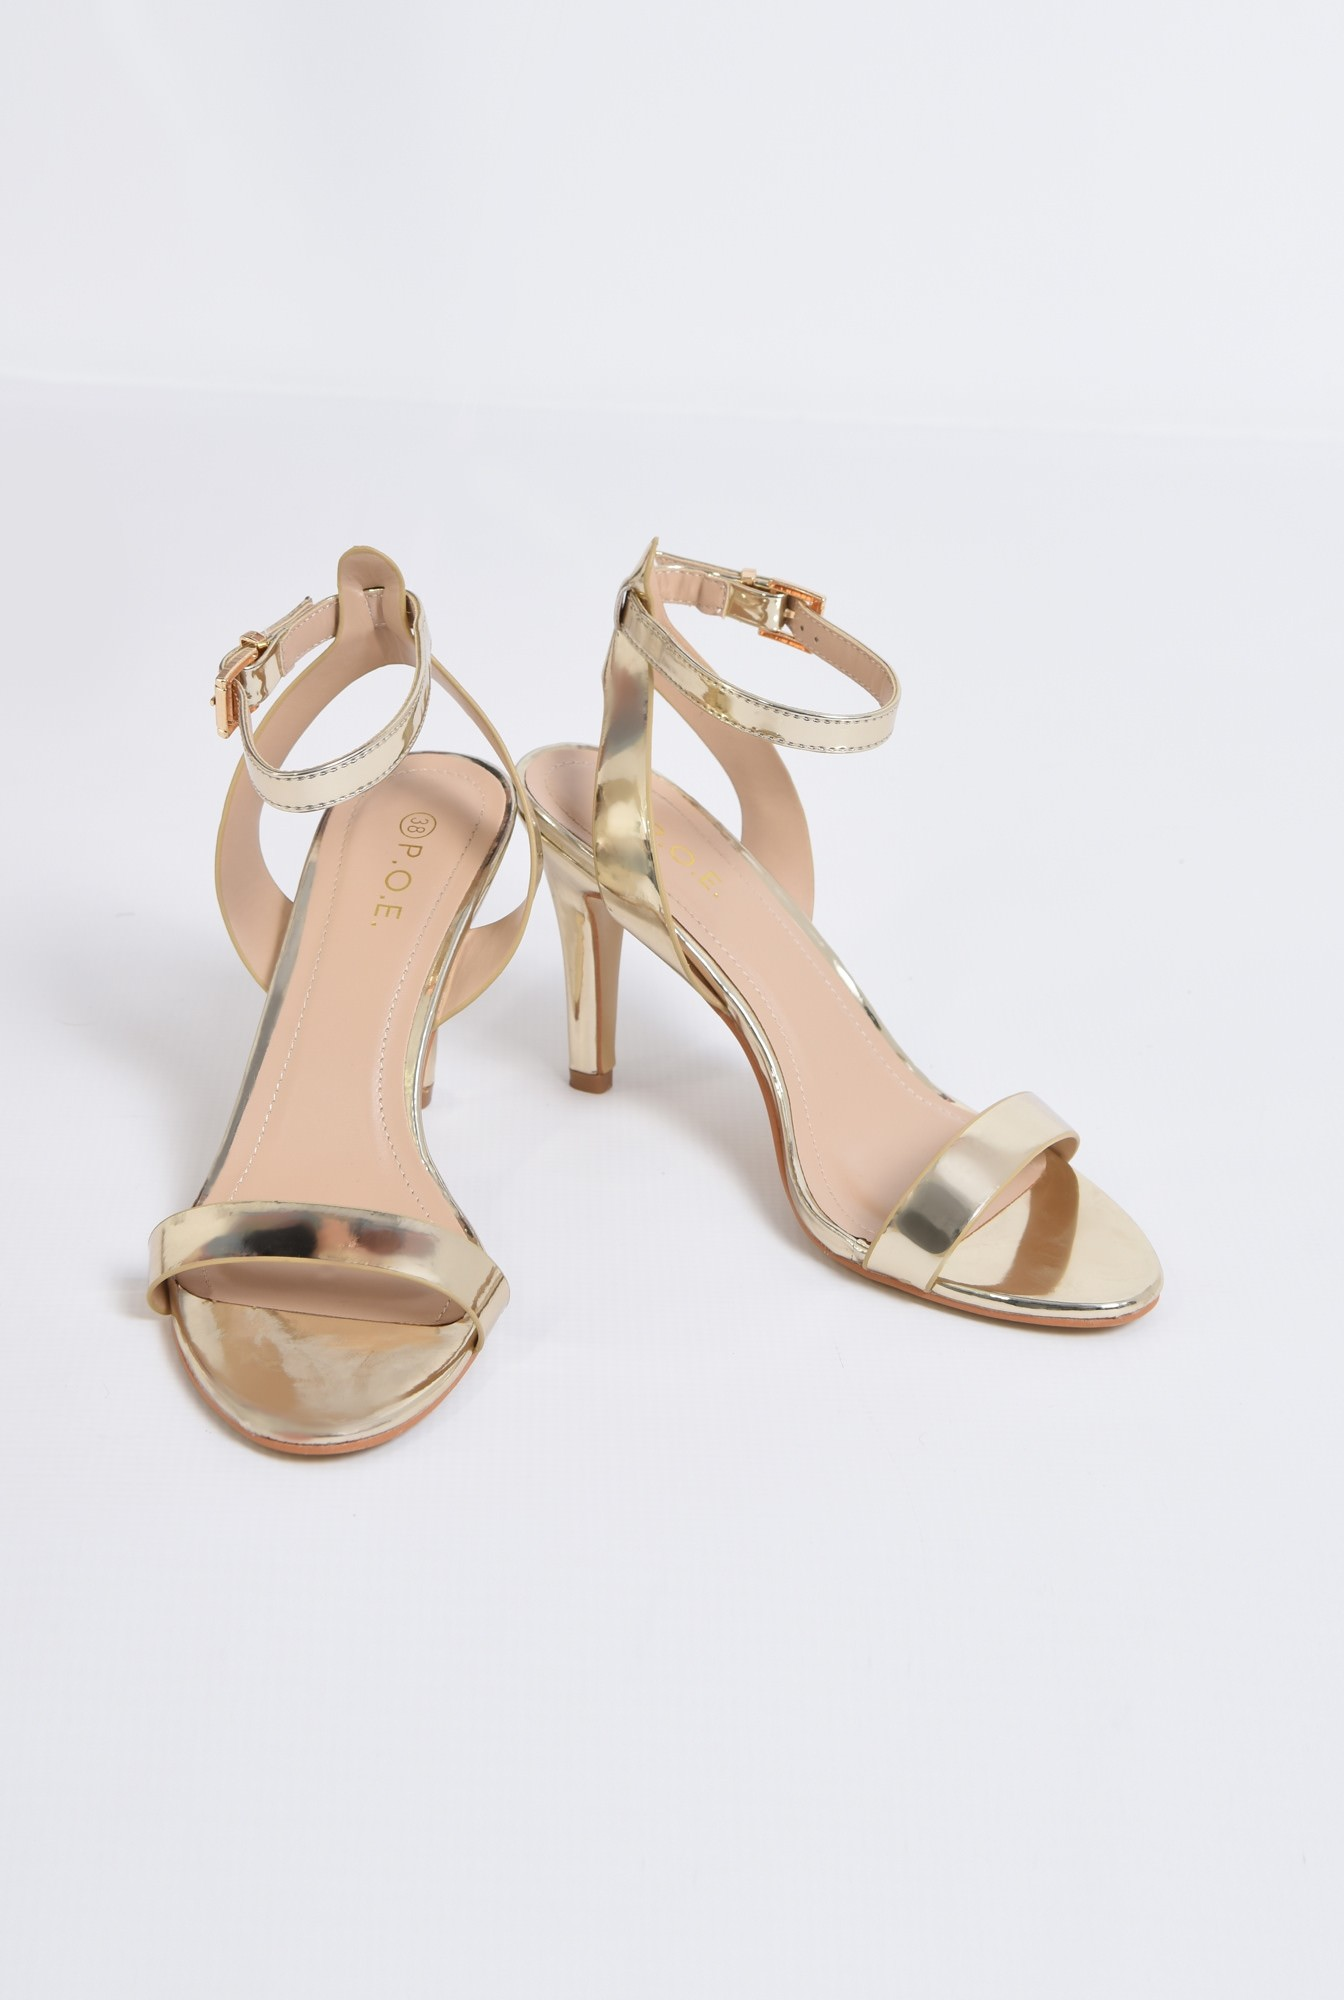 3 - sandale elegante, aurii, cu toc subtire